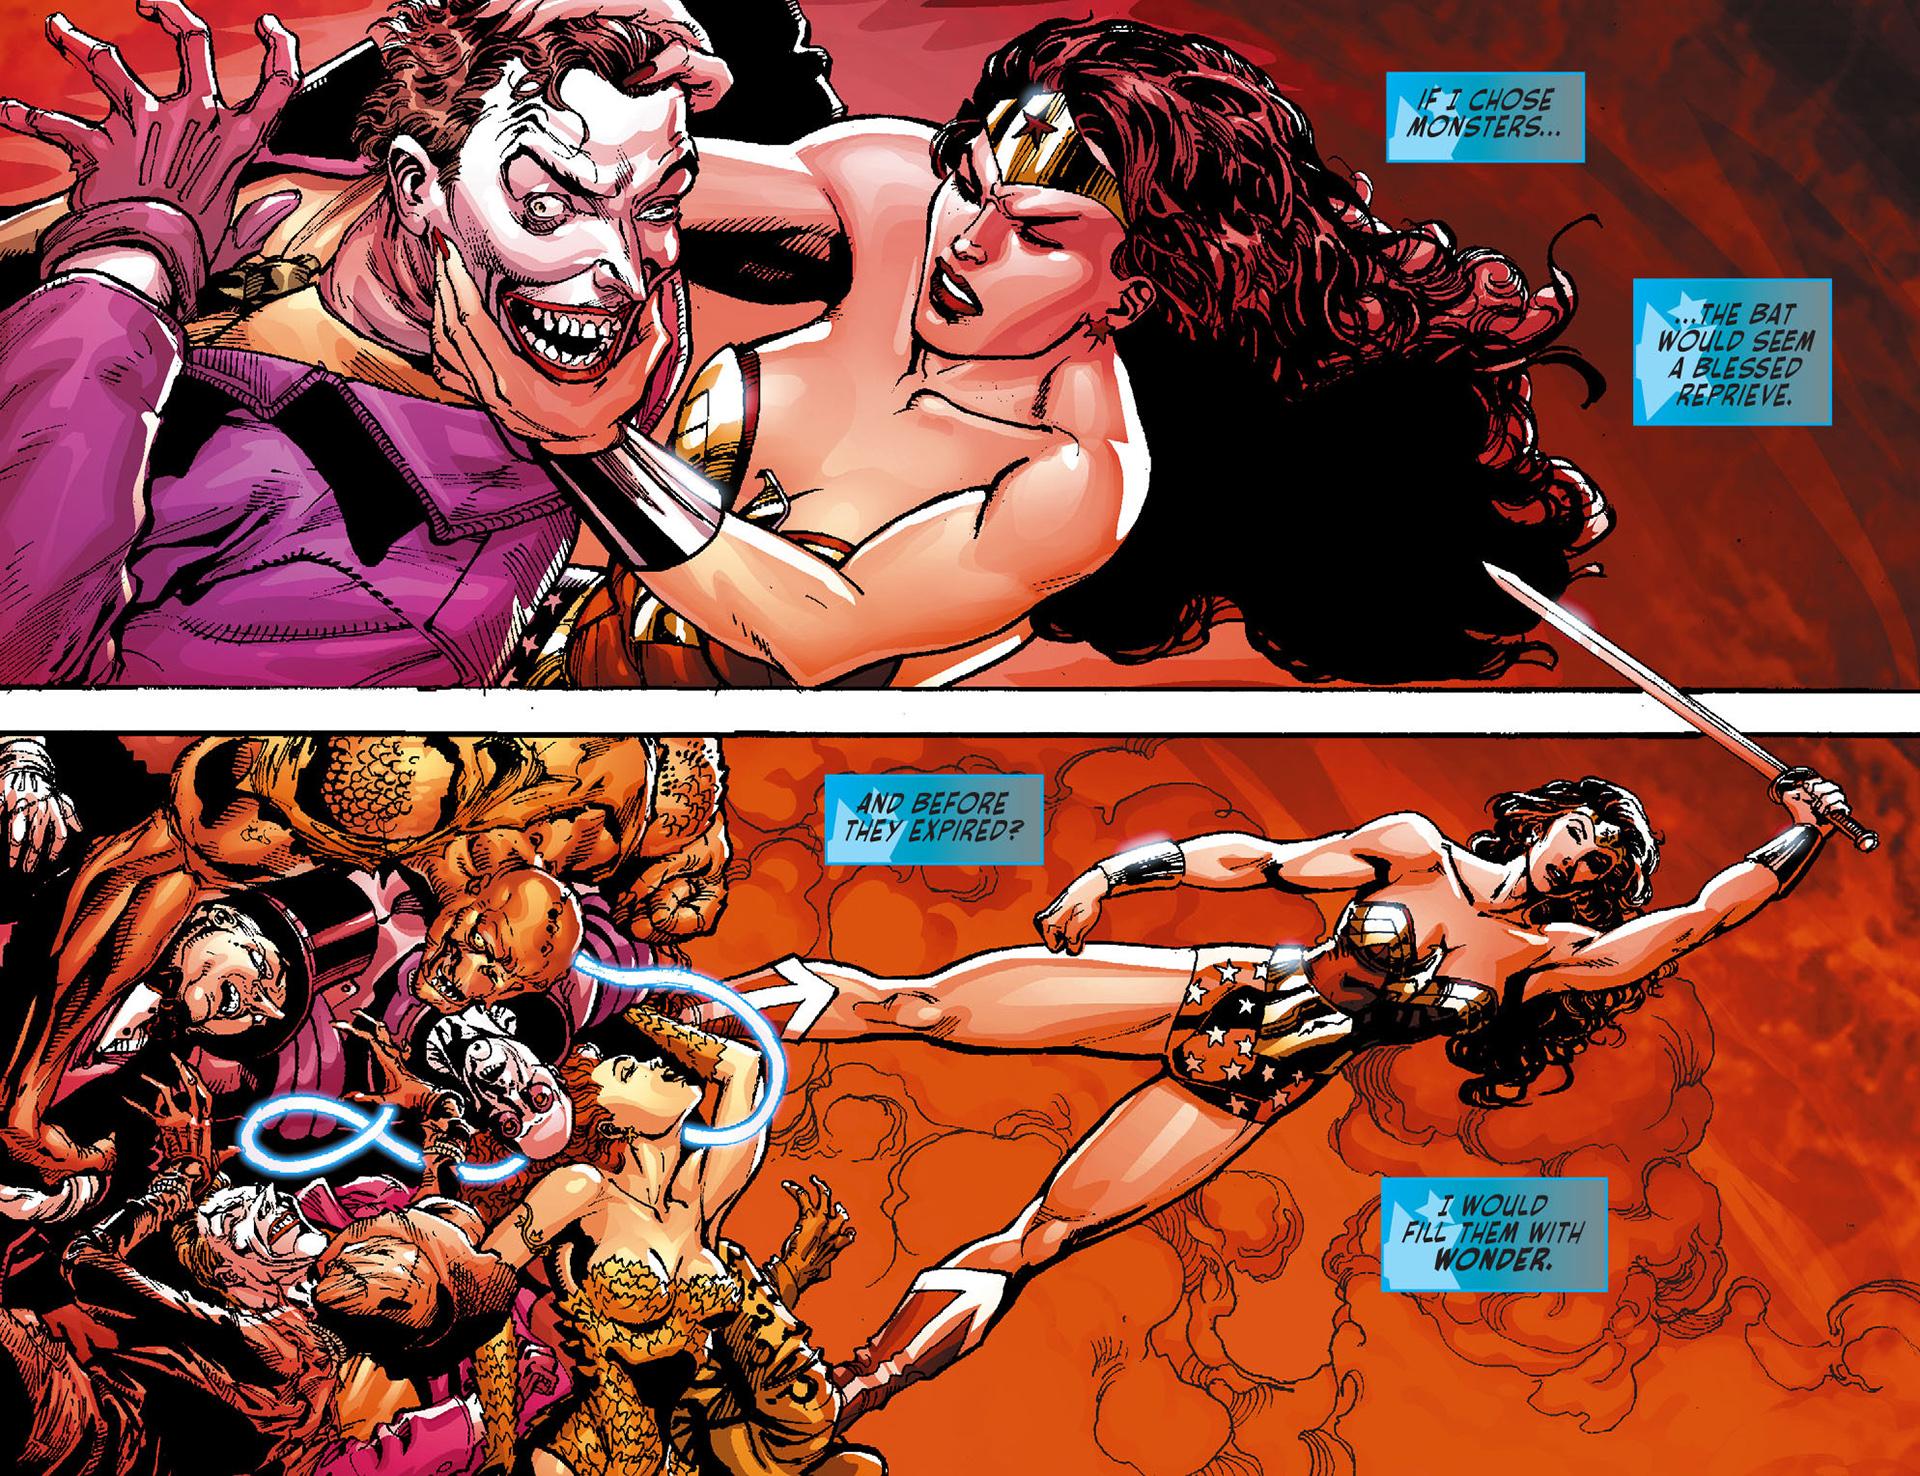 Read online Sensation Comics Featuring Wonder Woman comic -  Issue #2 - 12